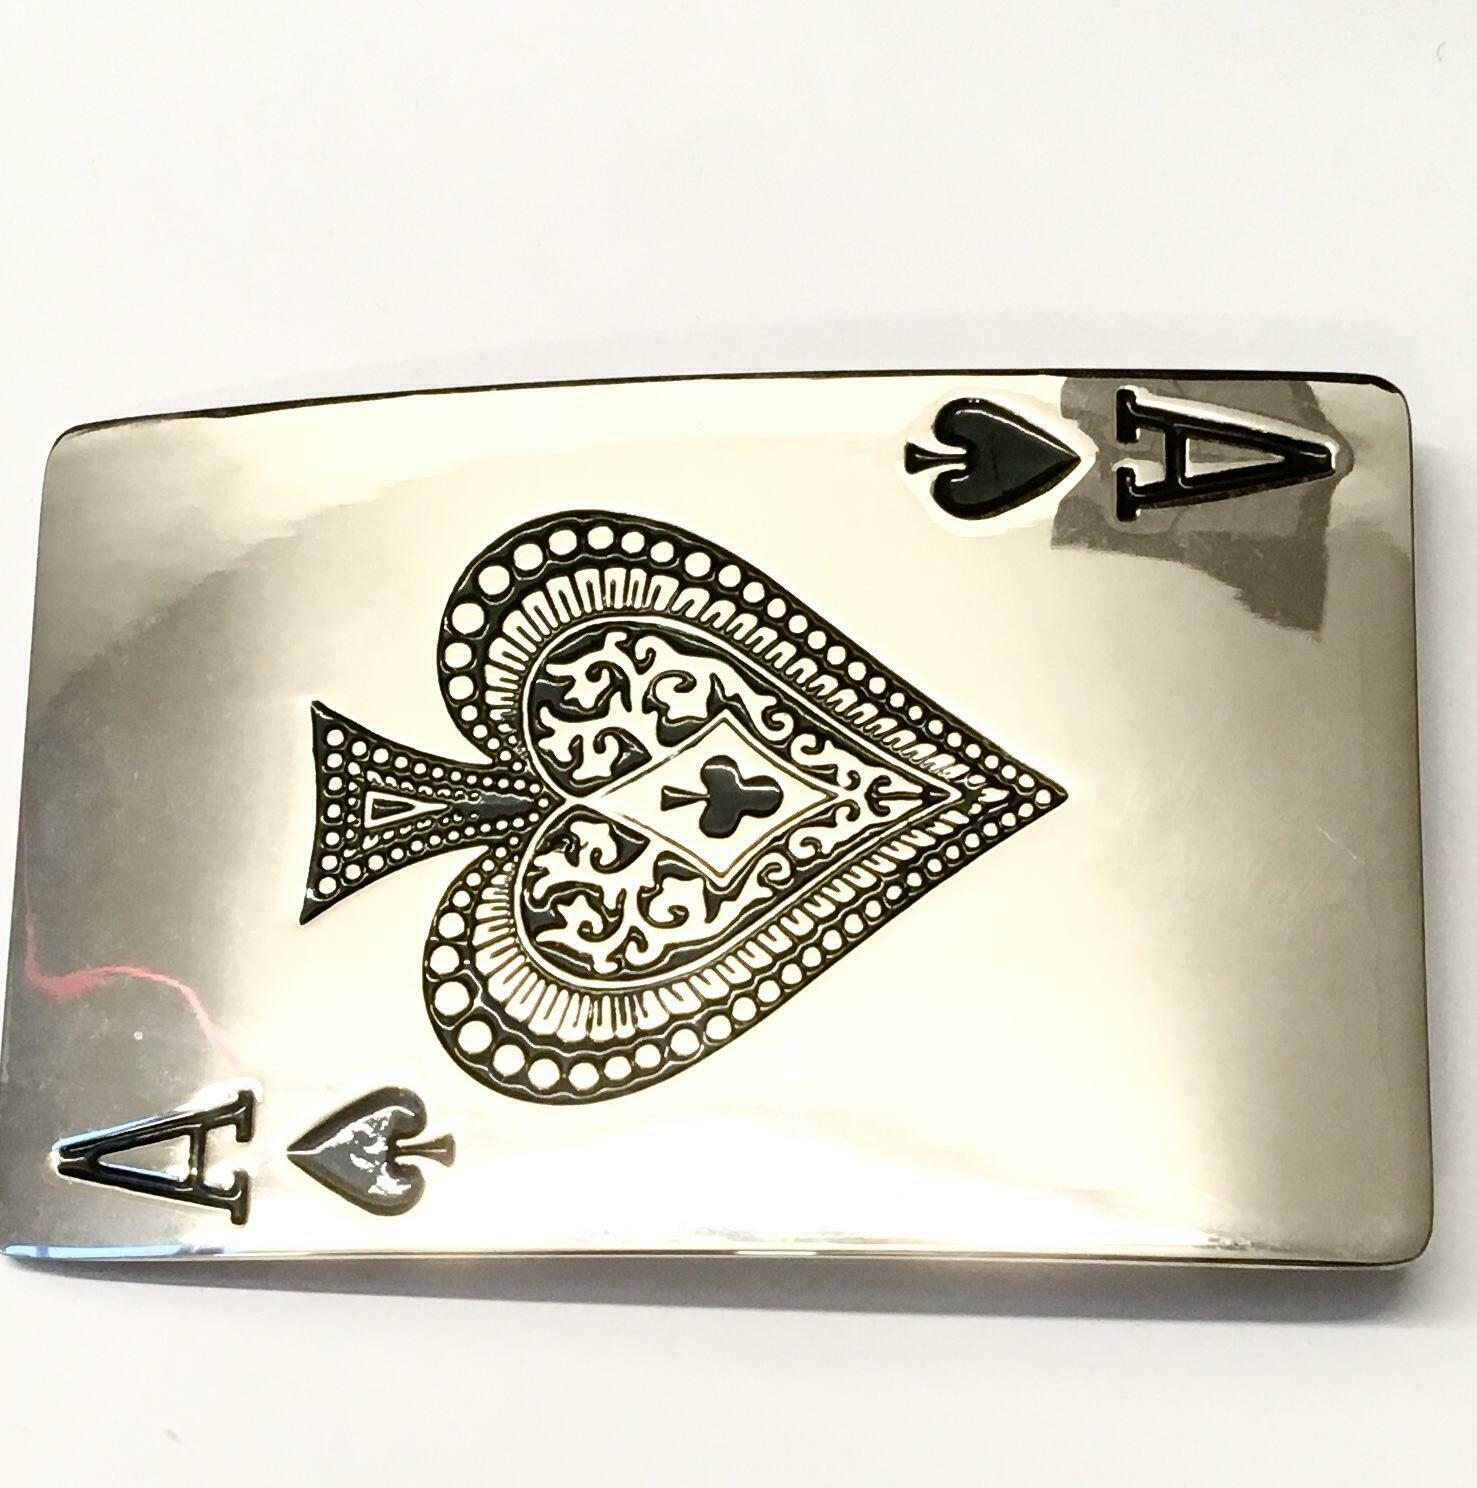 Belt buckle playing card poker symbols silver